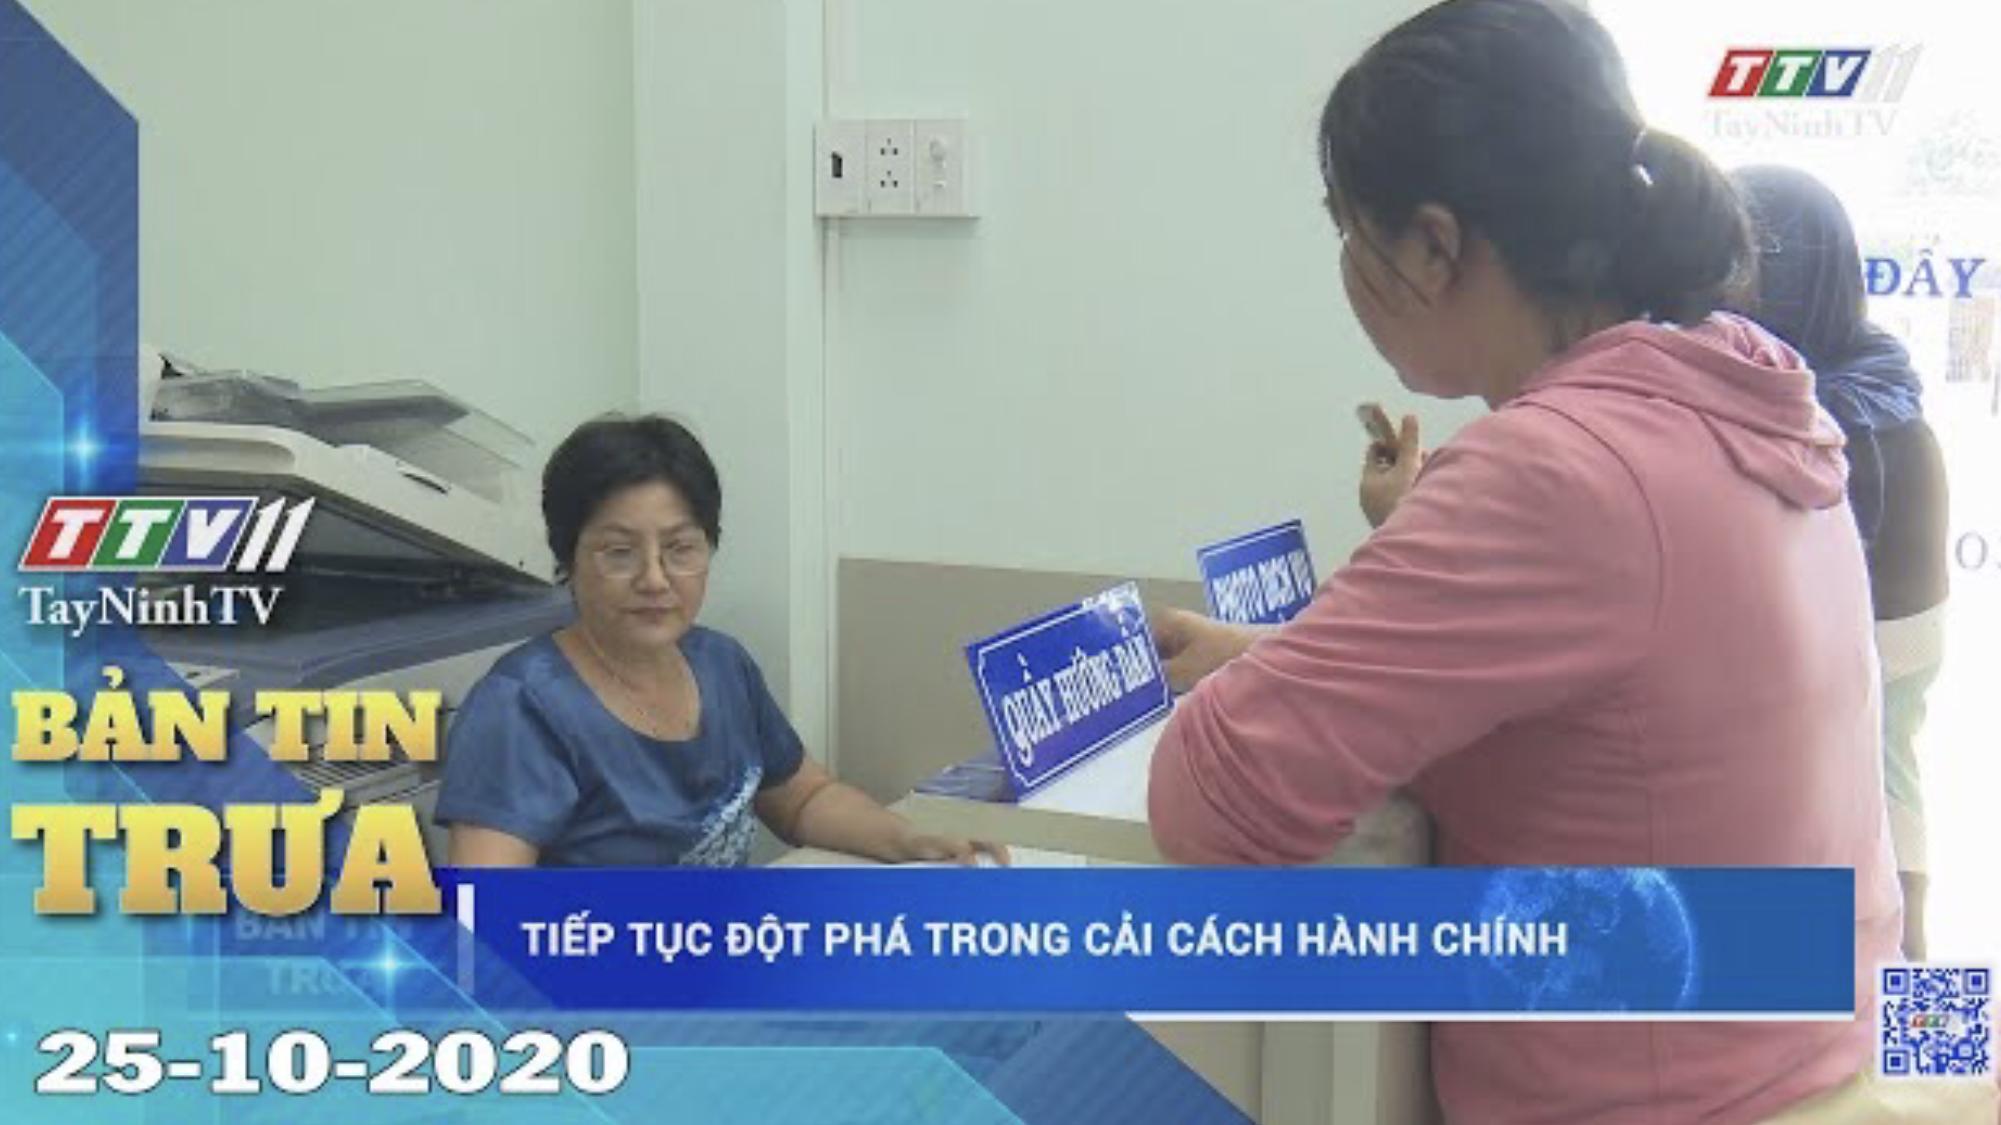 Bản tin trưa 25-10-2020 | Tin tức hôm nay | TayNinhTV